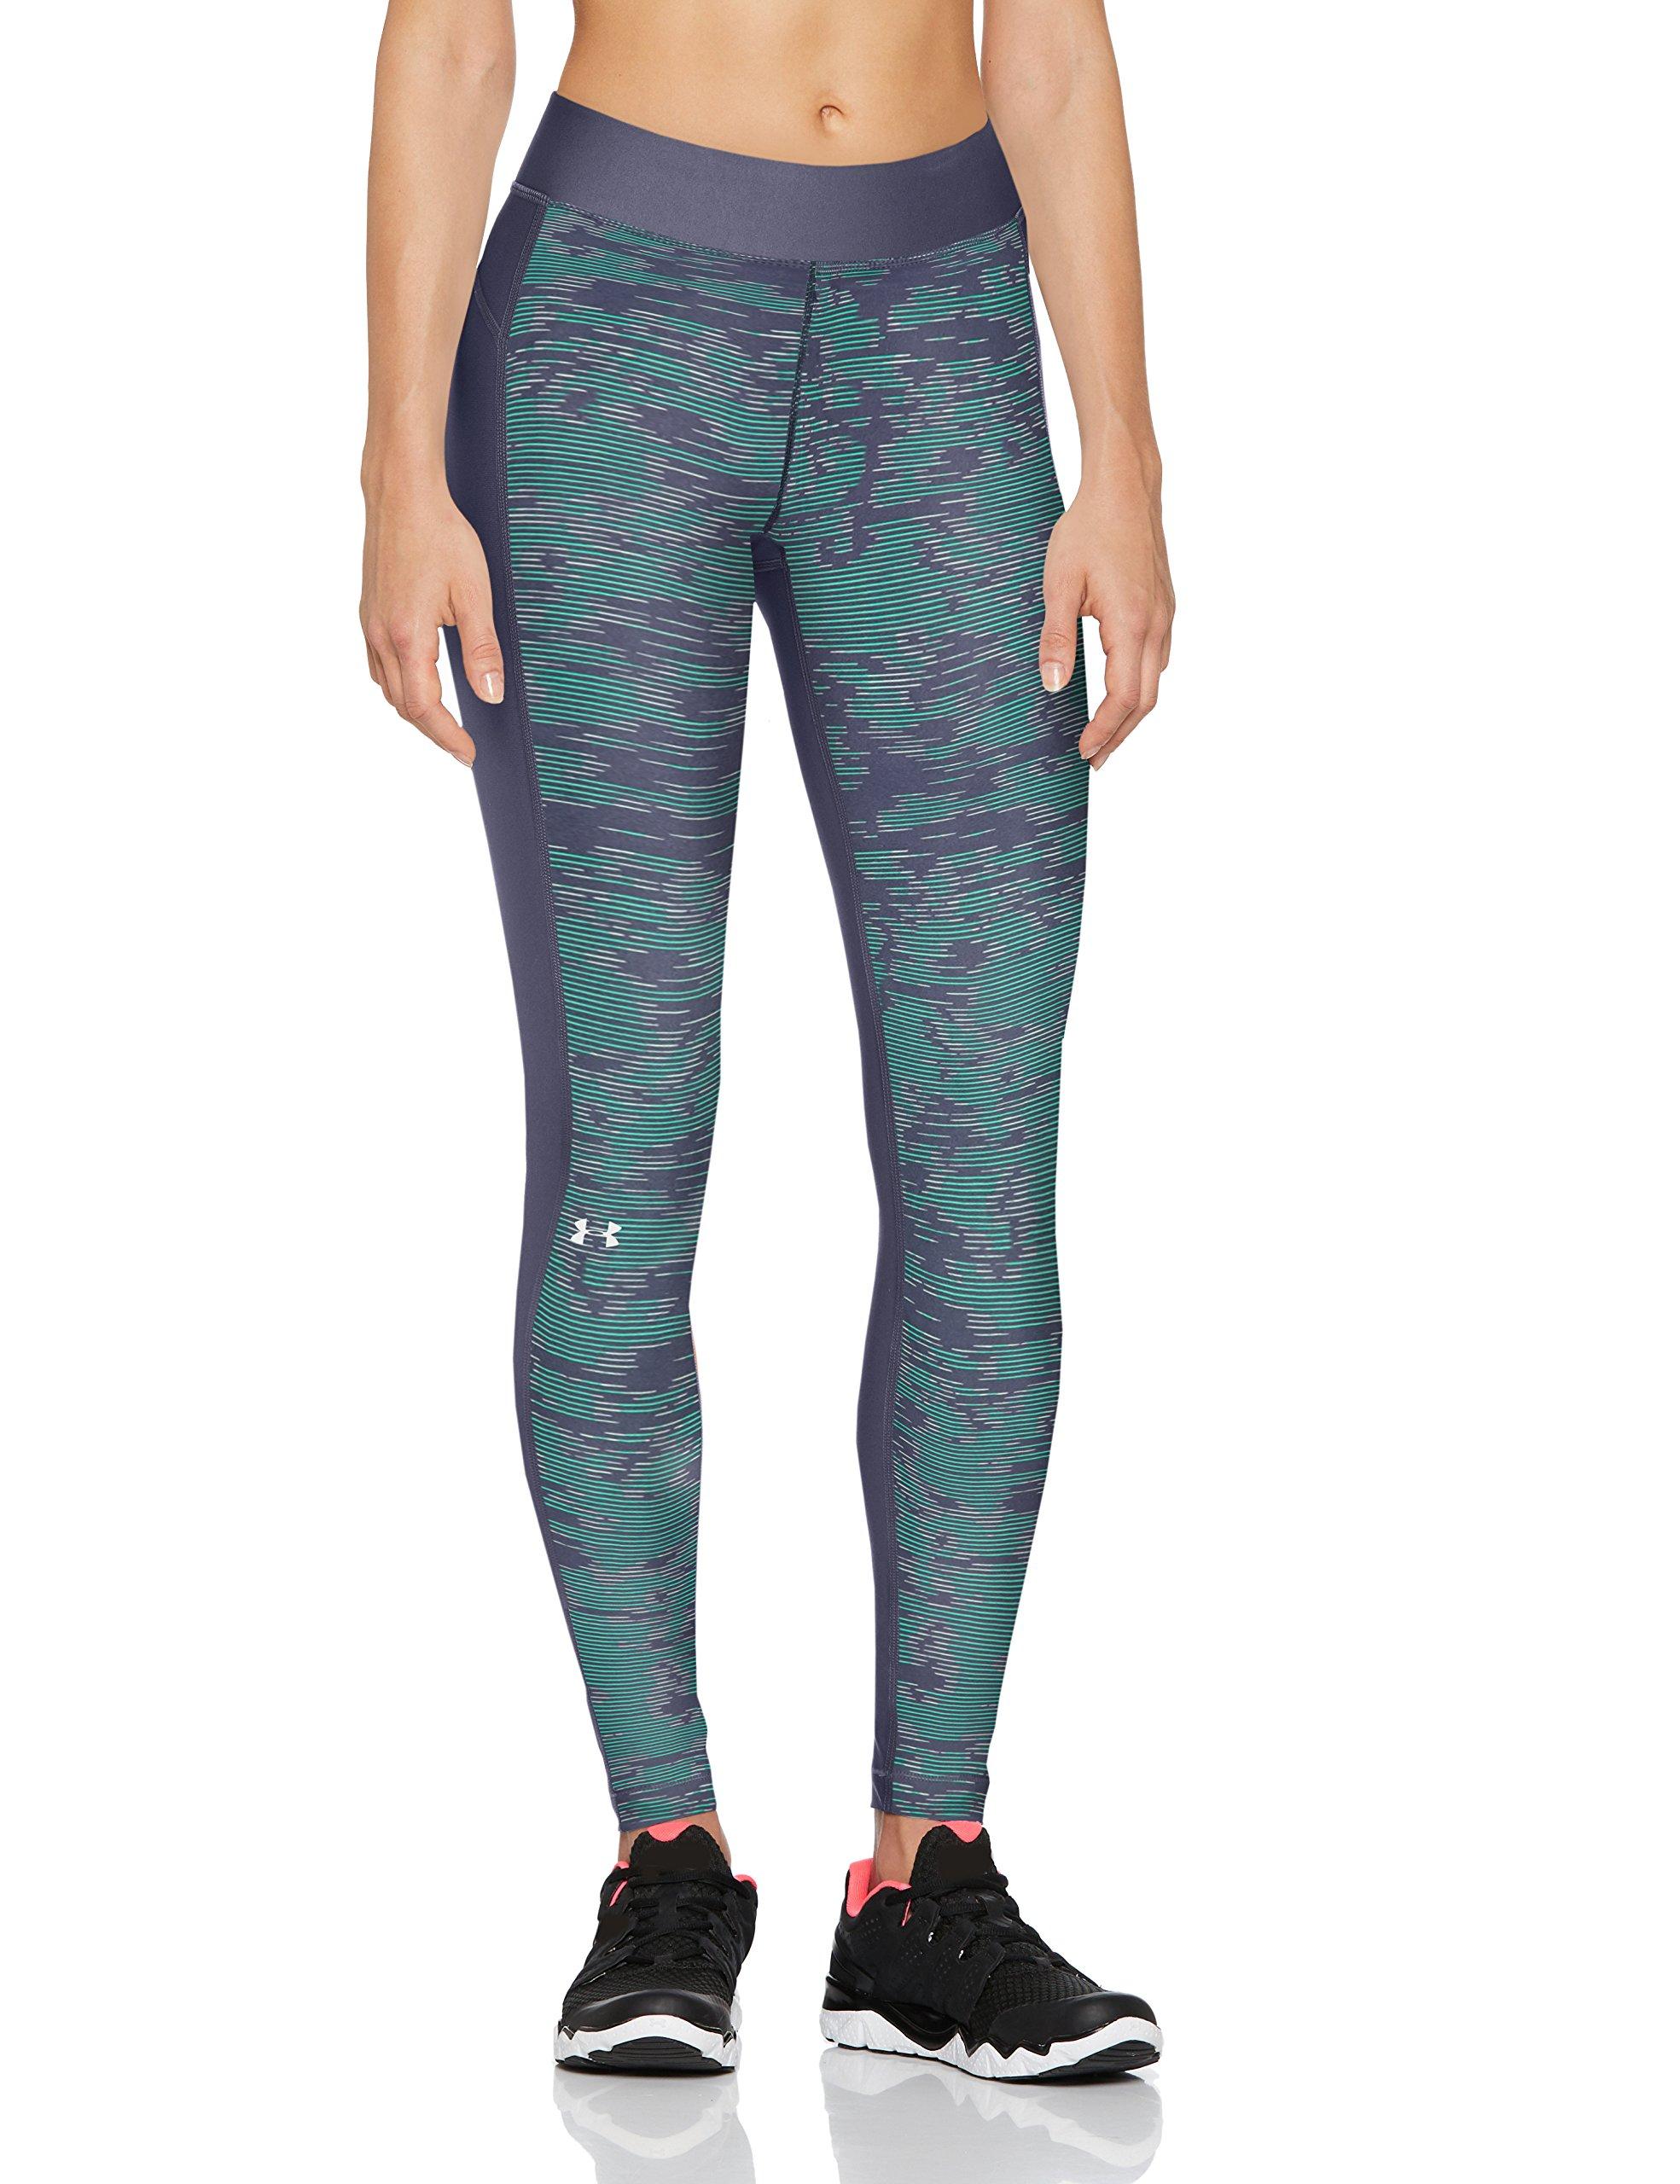 Under Armour Women's HeatGear Printed Legging